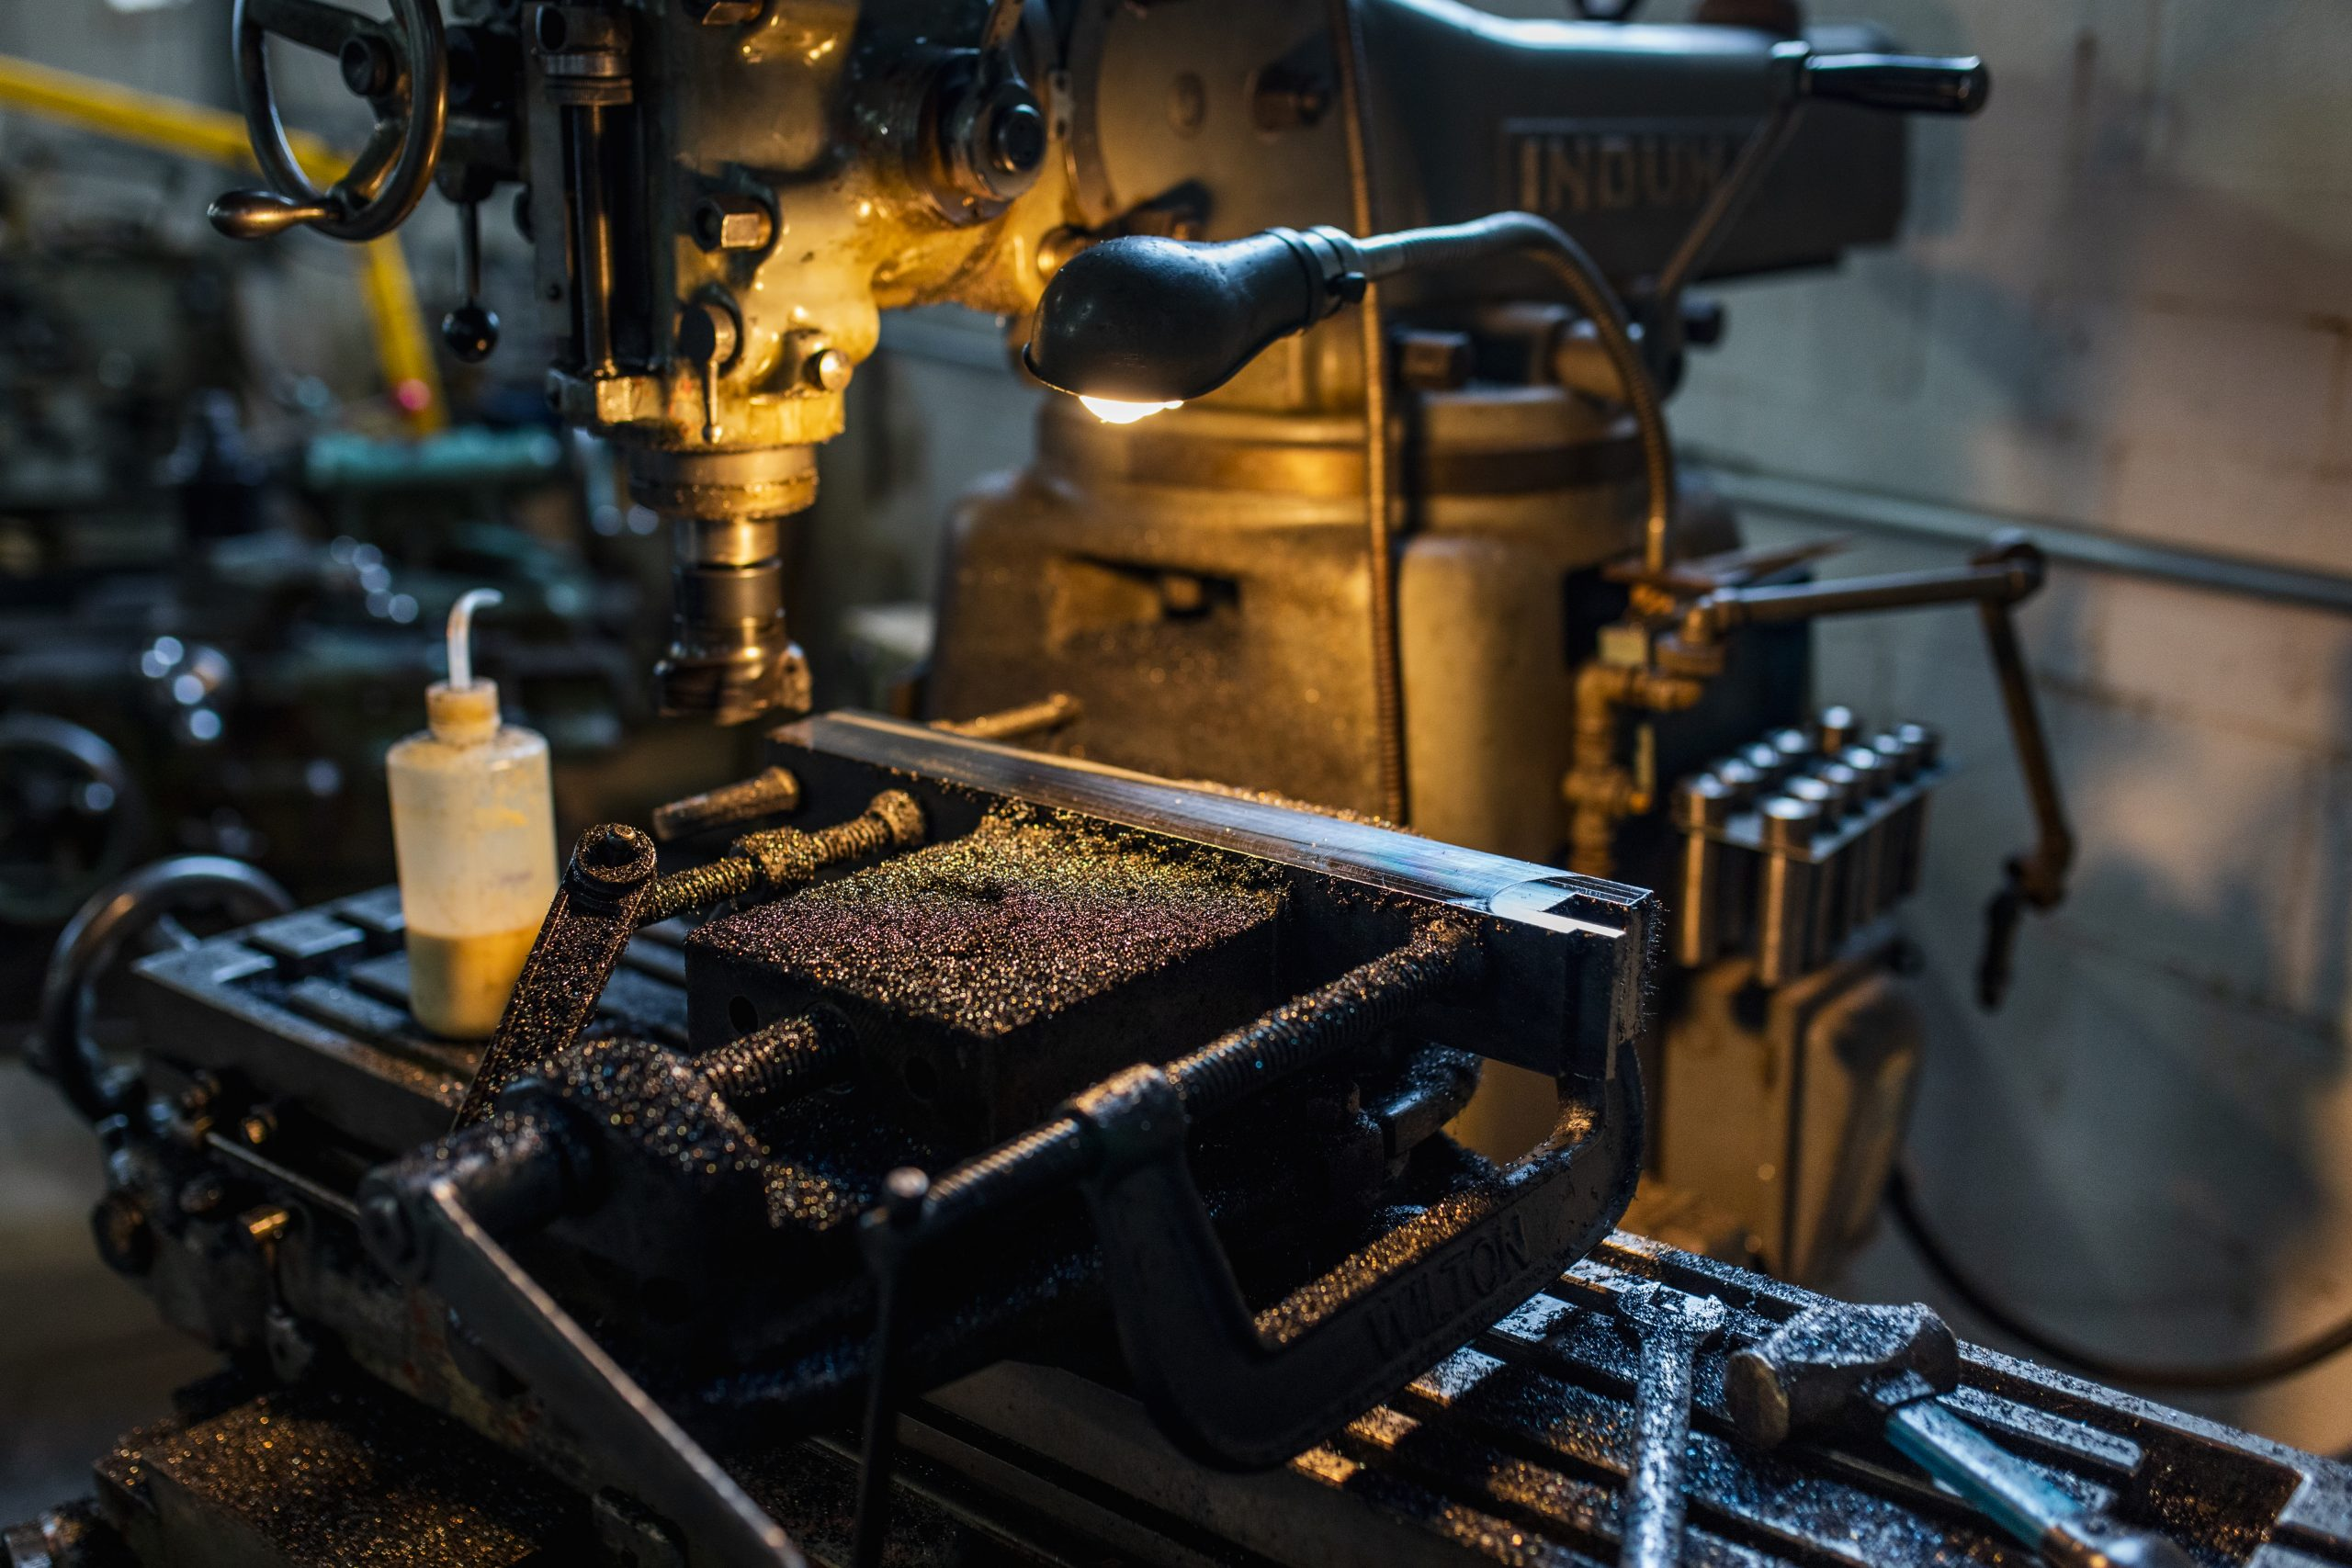 drill press and lamp close up